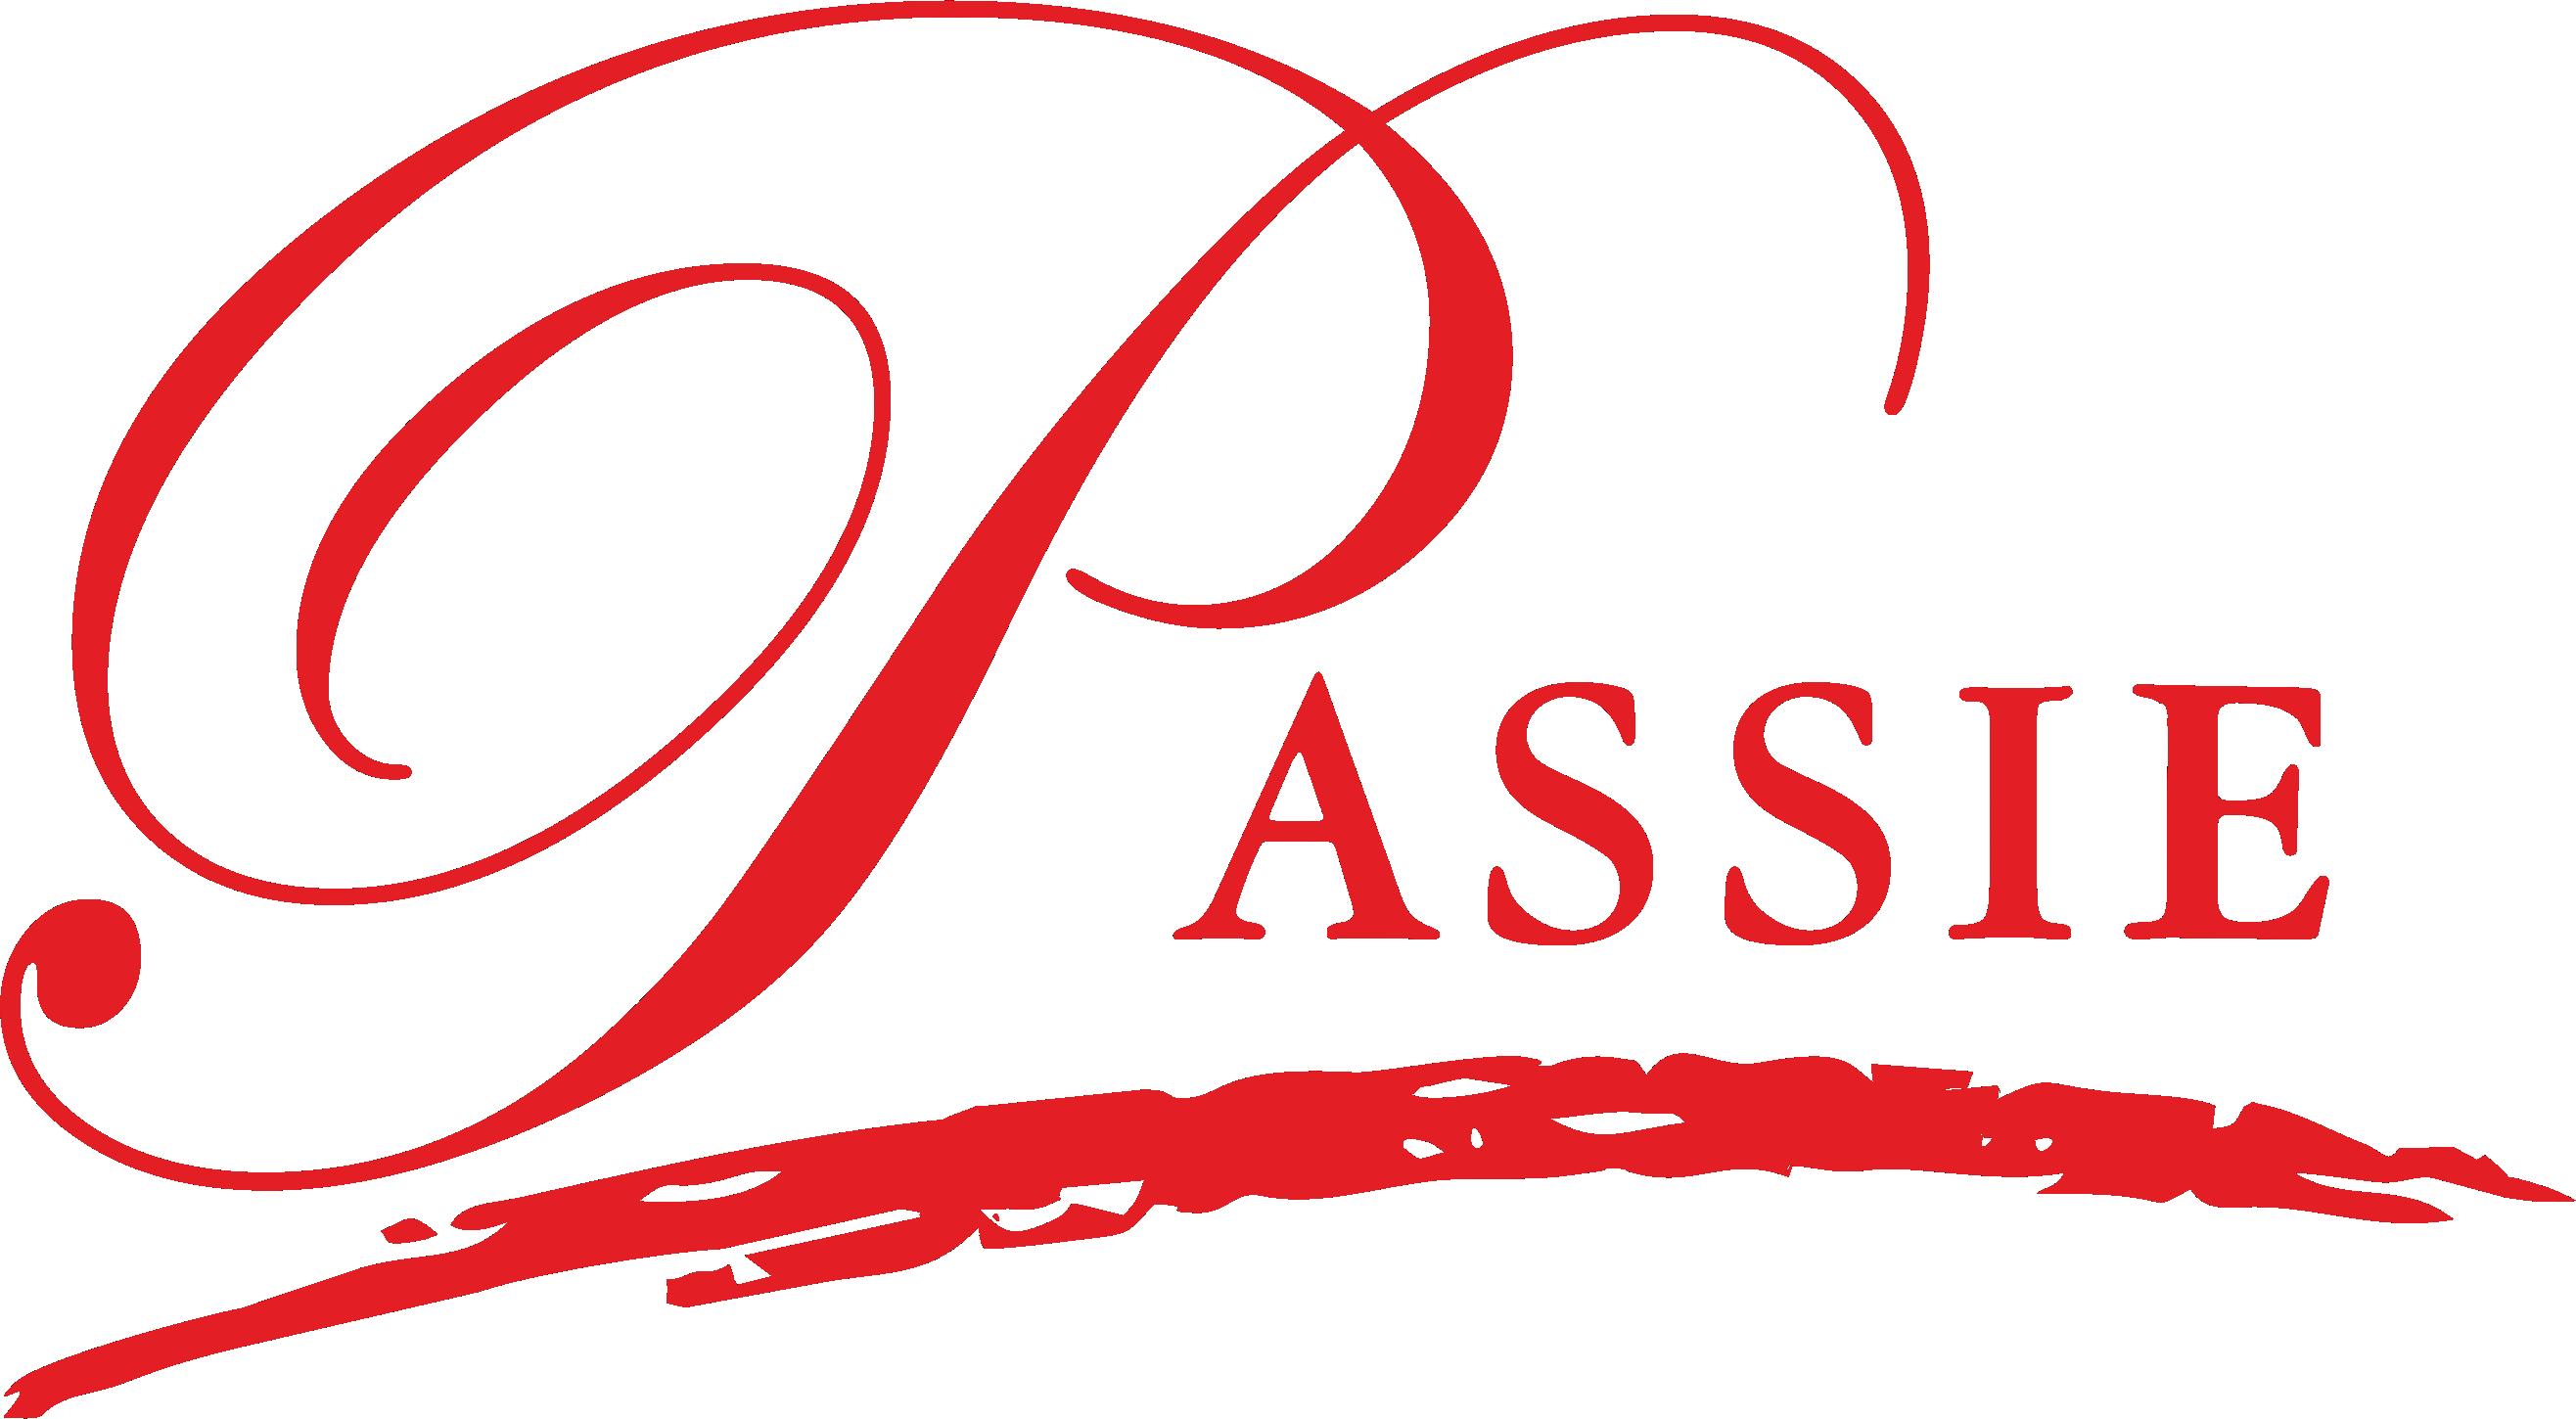 Passie Logo